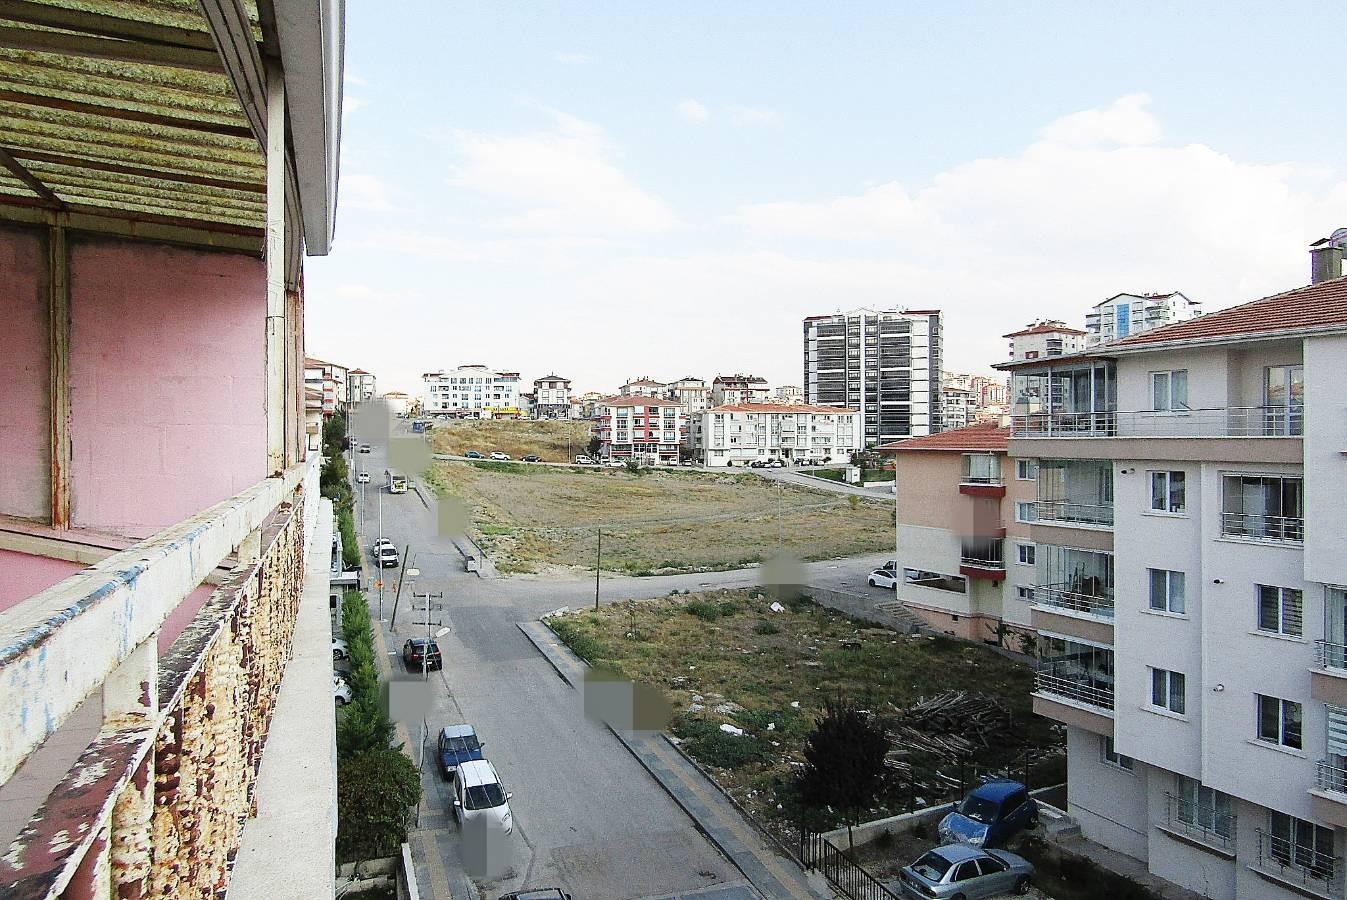 SR EMLAK'TAN PİYADE  MAH'DE 5+1 250m² ÖN CEPHE MANTOLAMALI TERAS